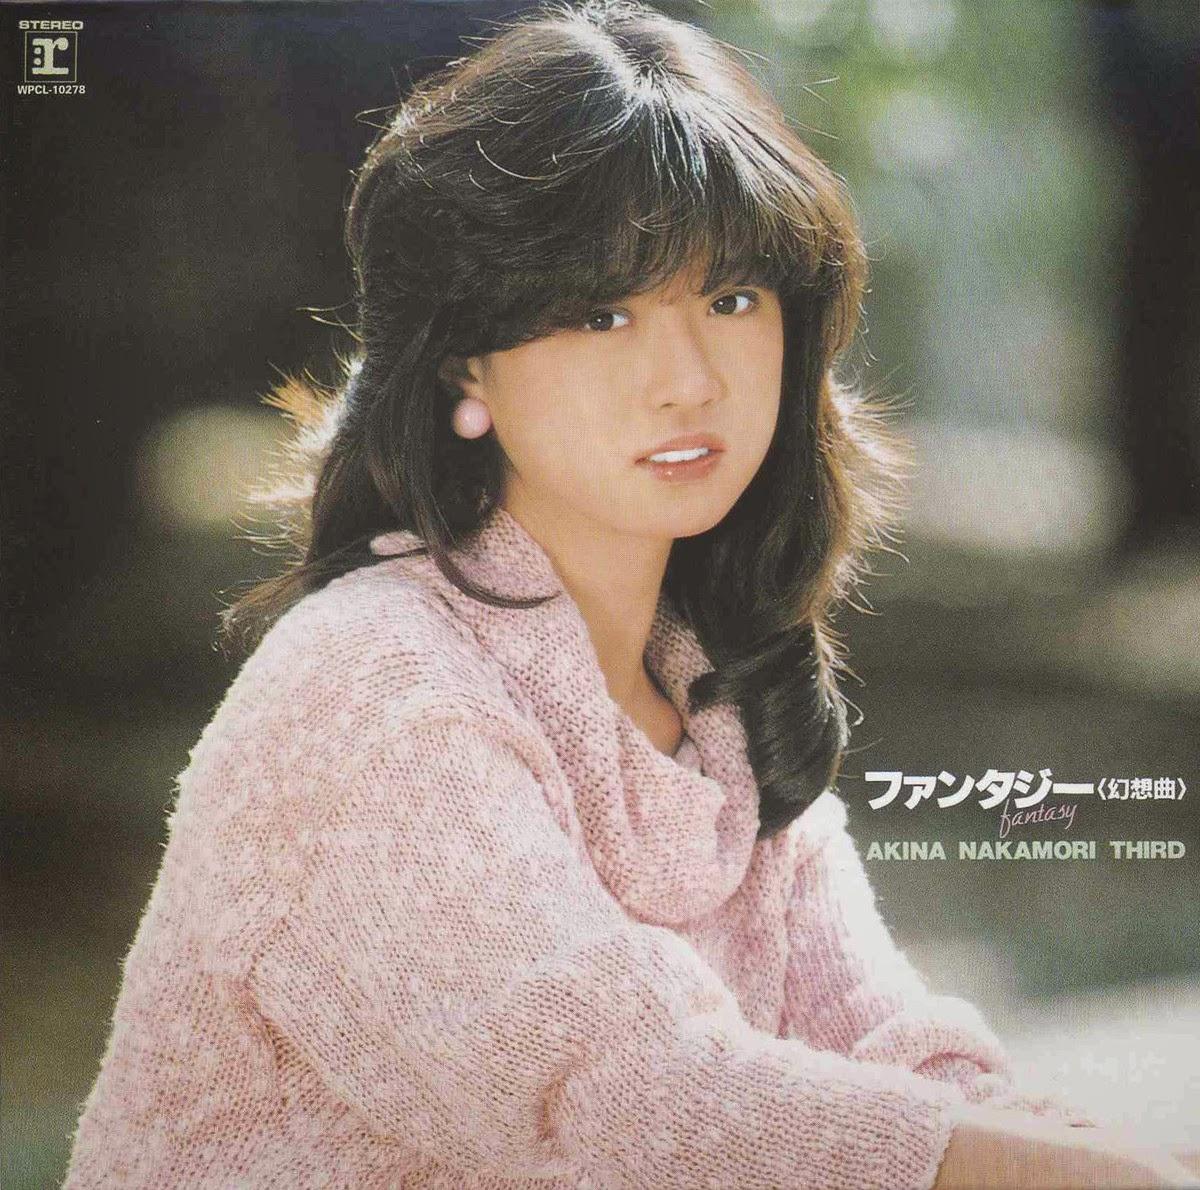 Akina nakamori photo gallery